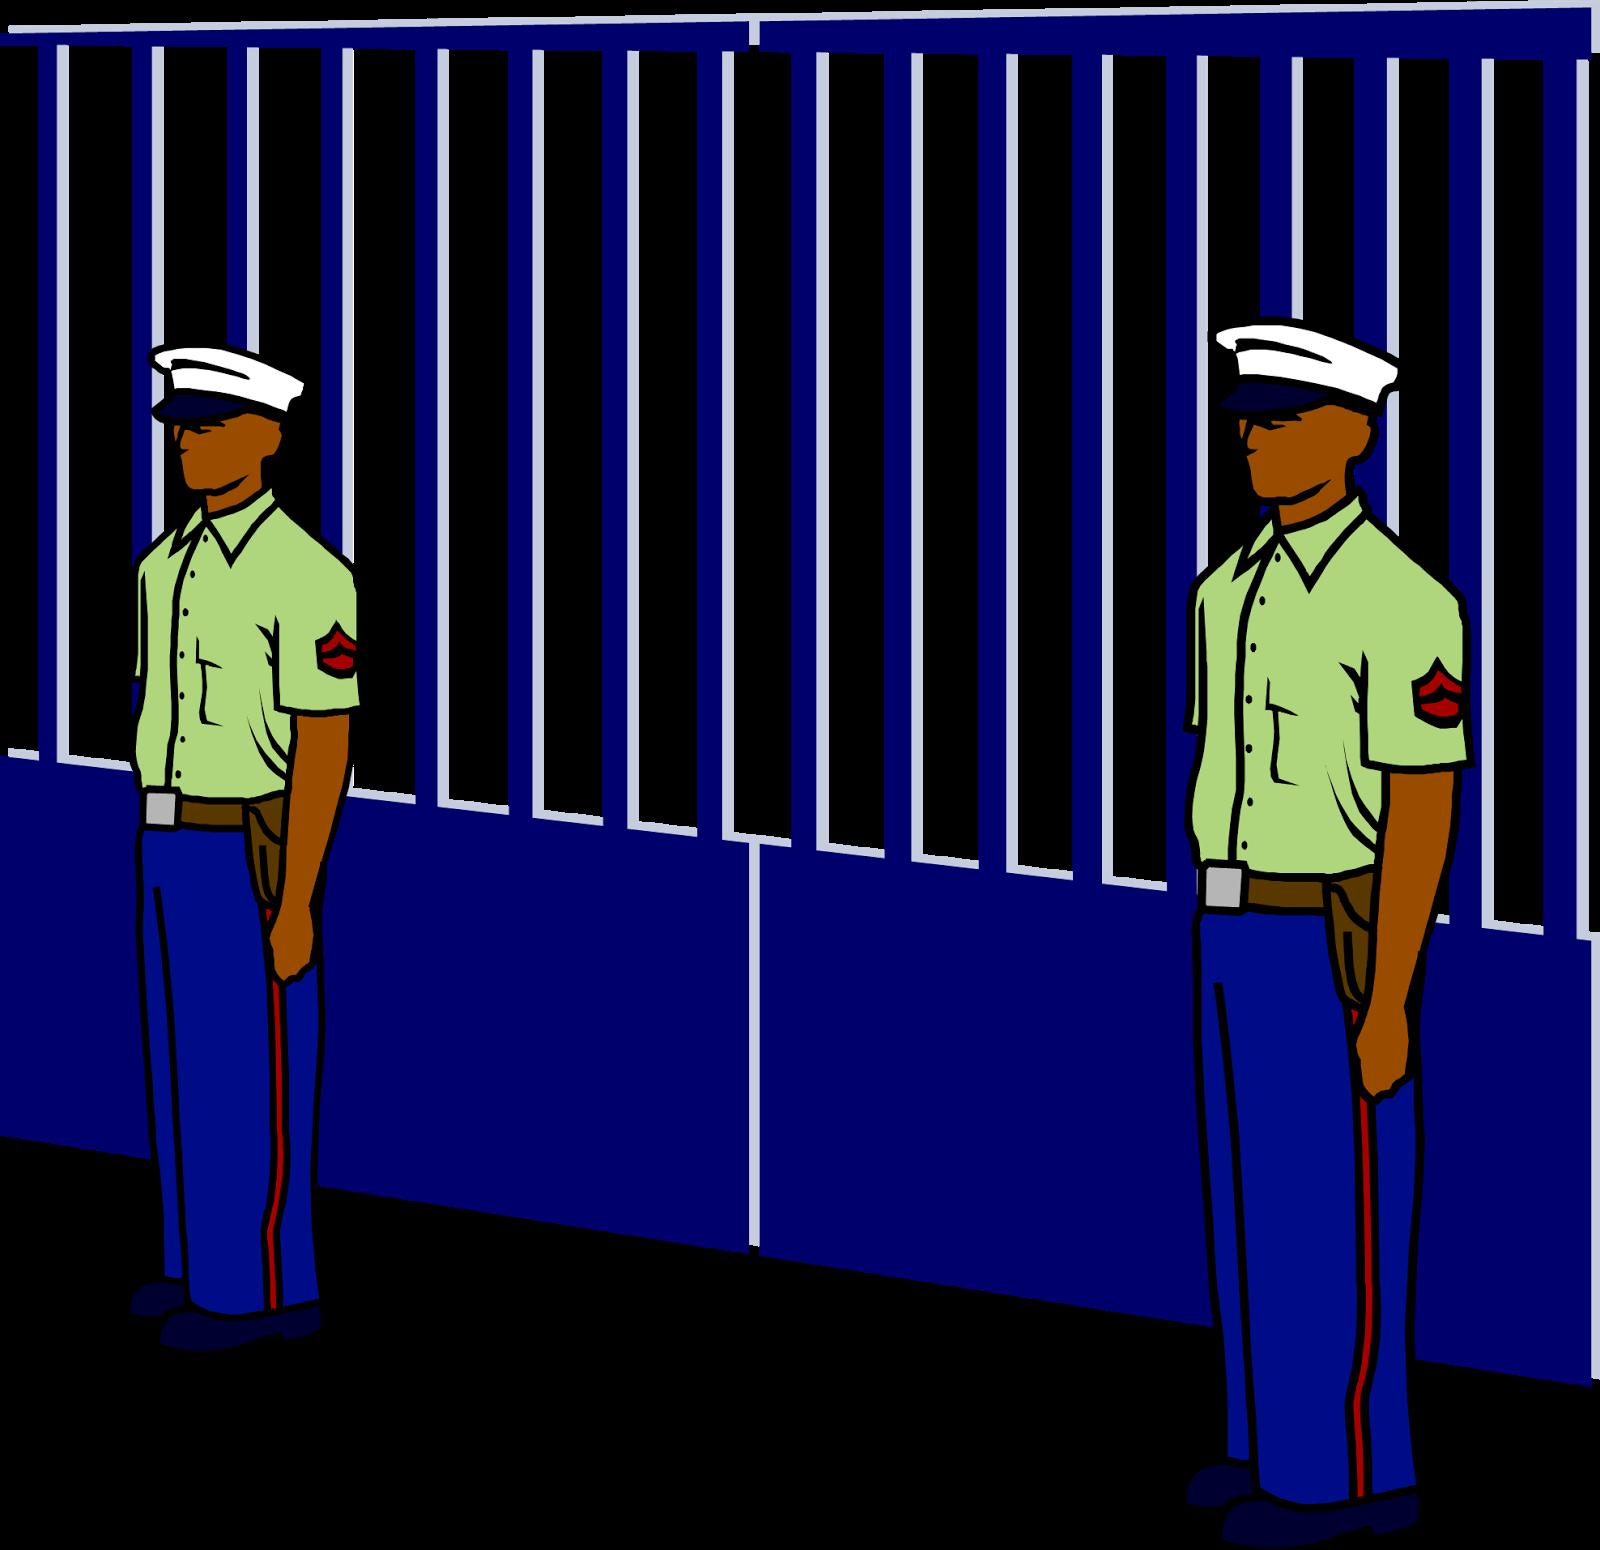 Tanzanian Missions The Gatekeeper